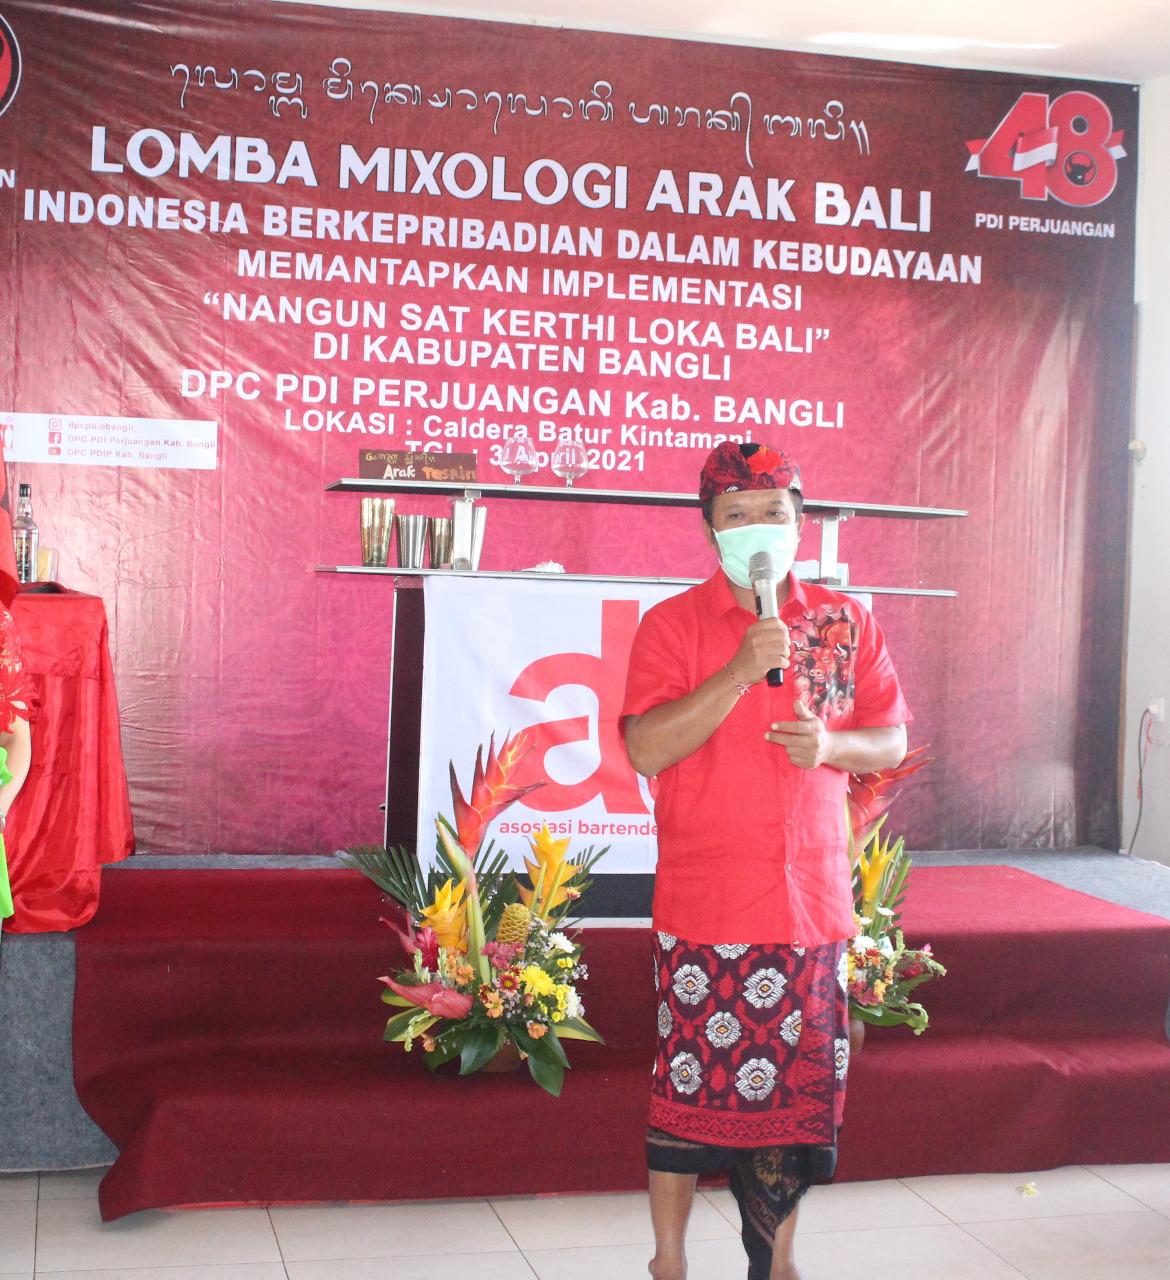 BUPATI Bangli, Sang Nyoman Sedana Arta, saat membuka mixologi arak bali, Sabtu (3/4/2021). Foto: ist